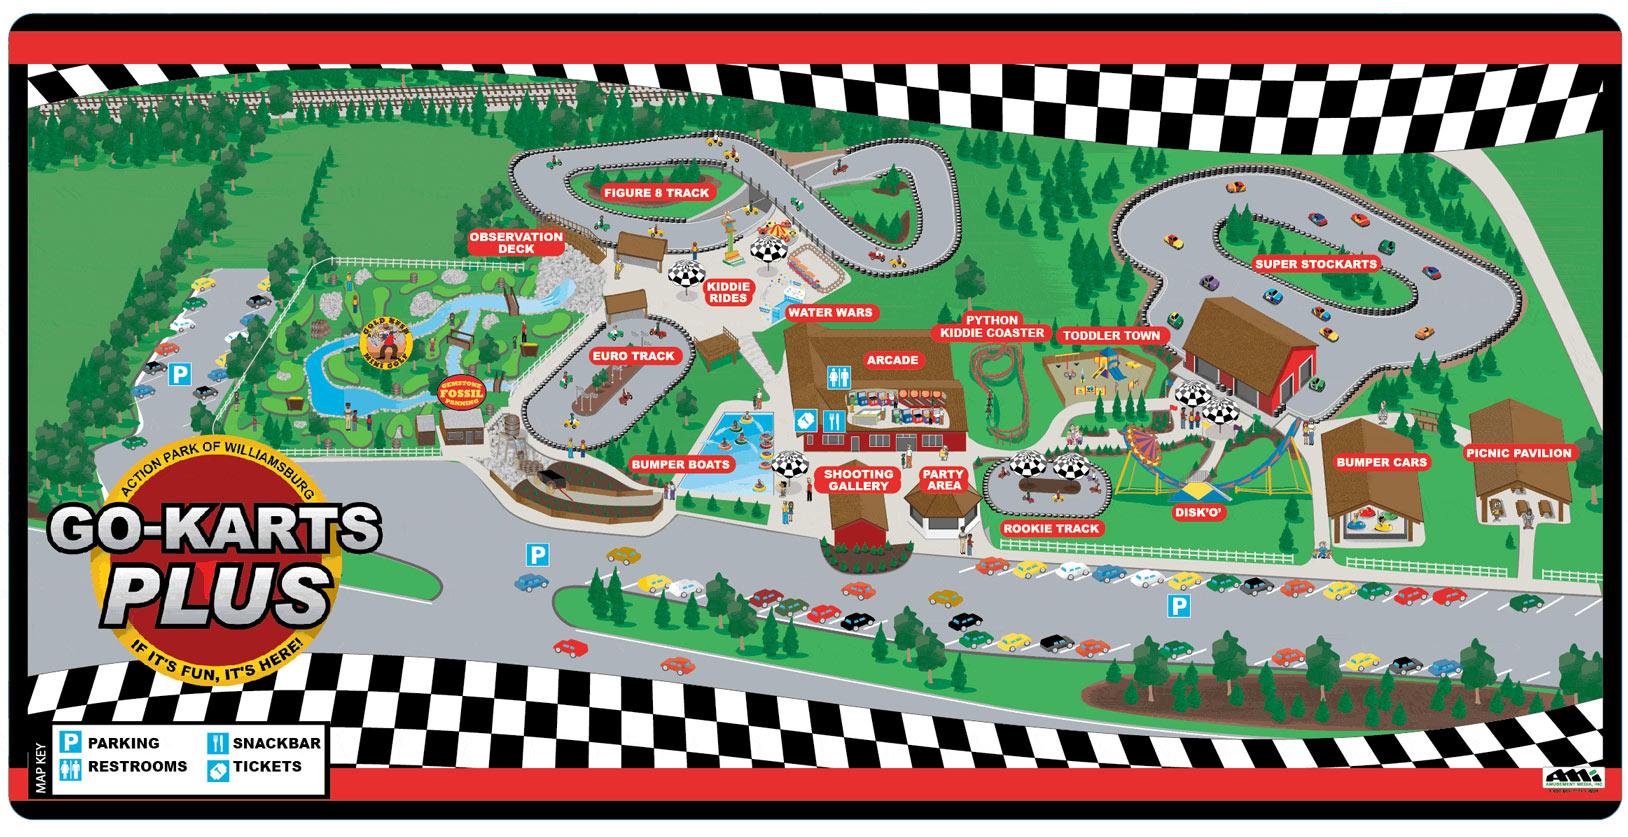 va kart Park Map | Go Karts Plus | Williamsburg Birthdays & Family Fun